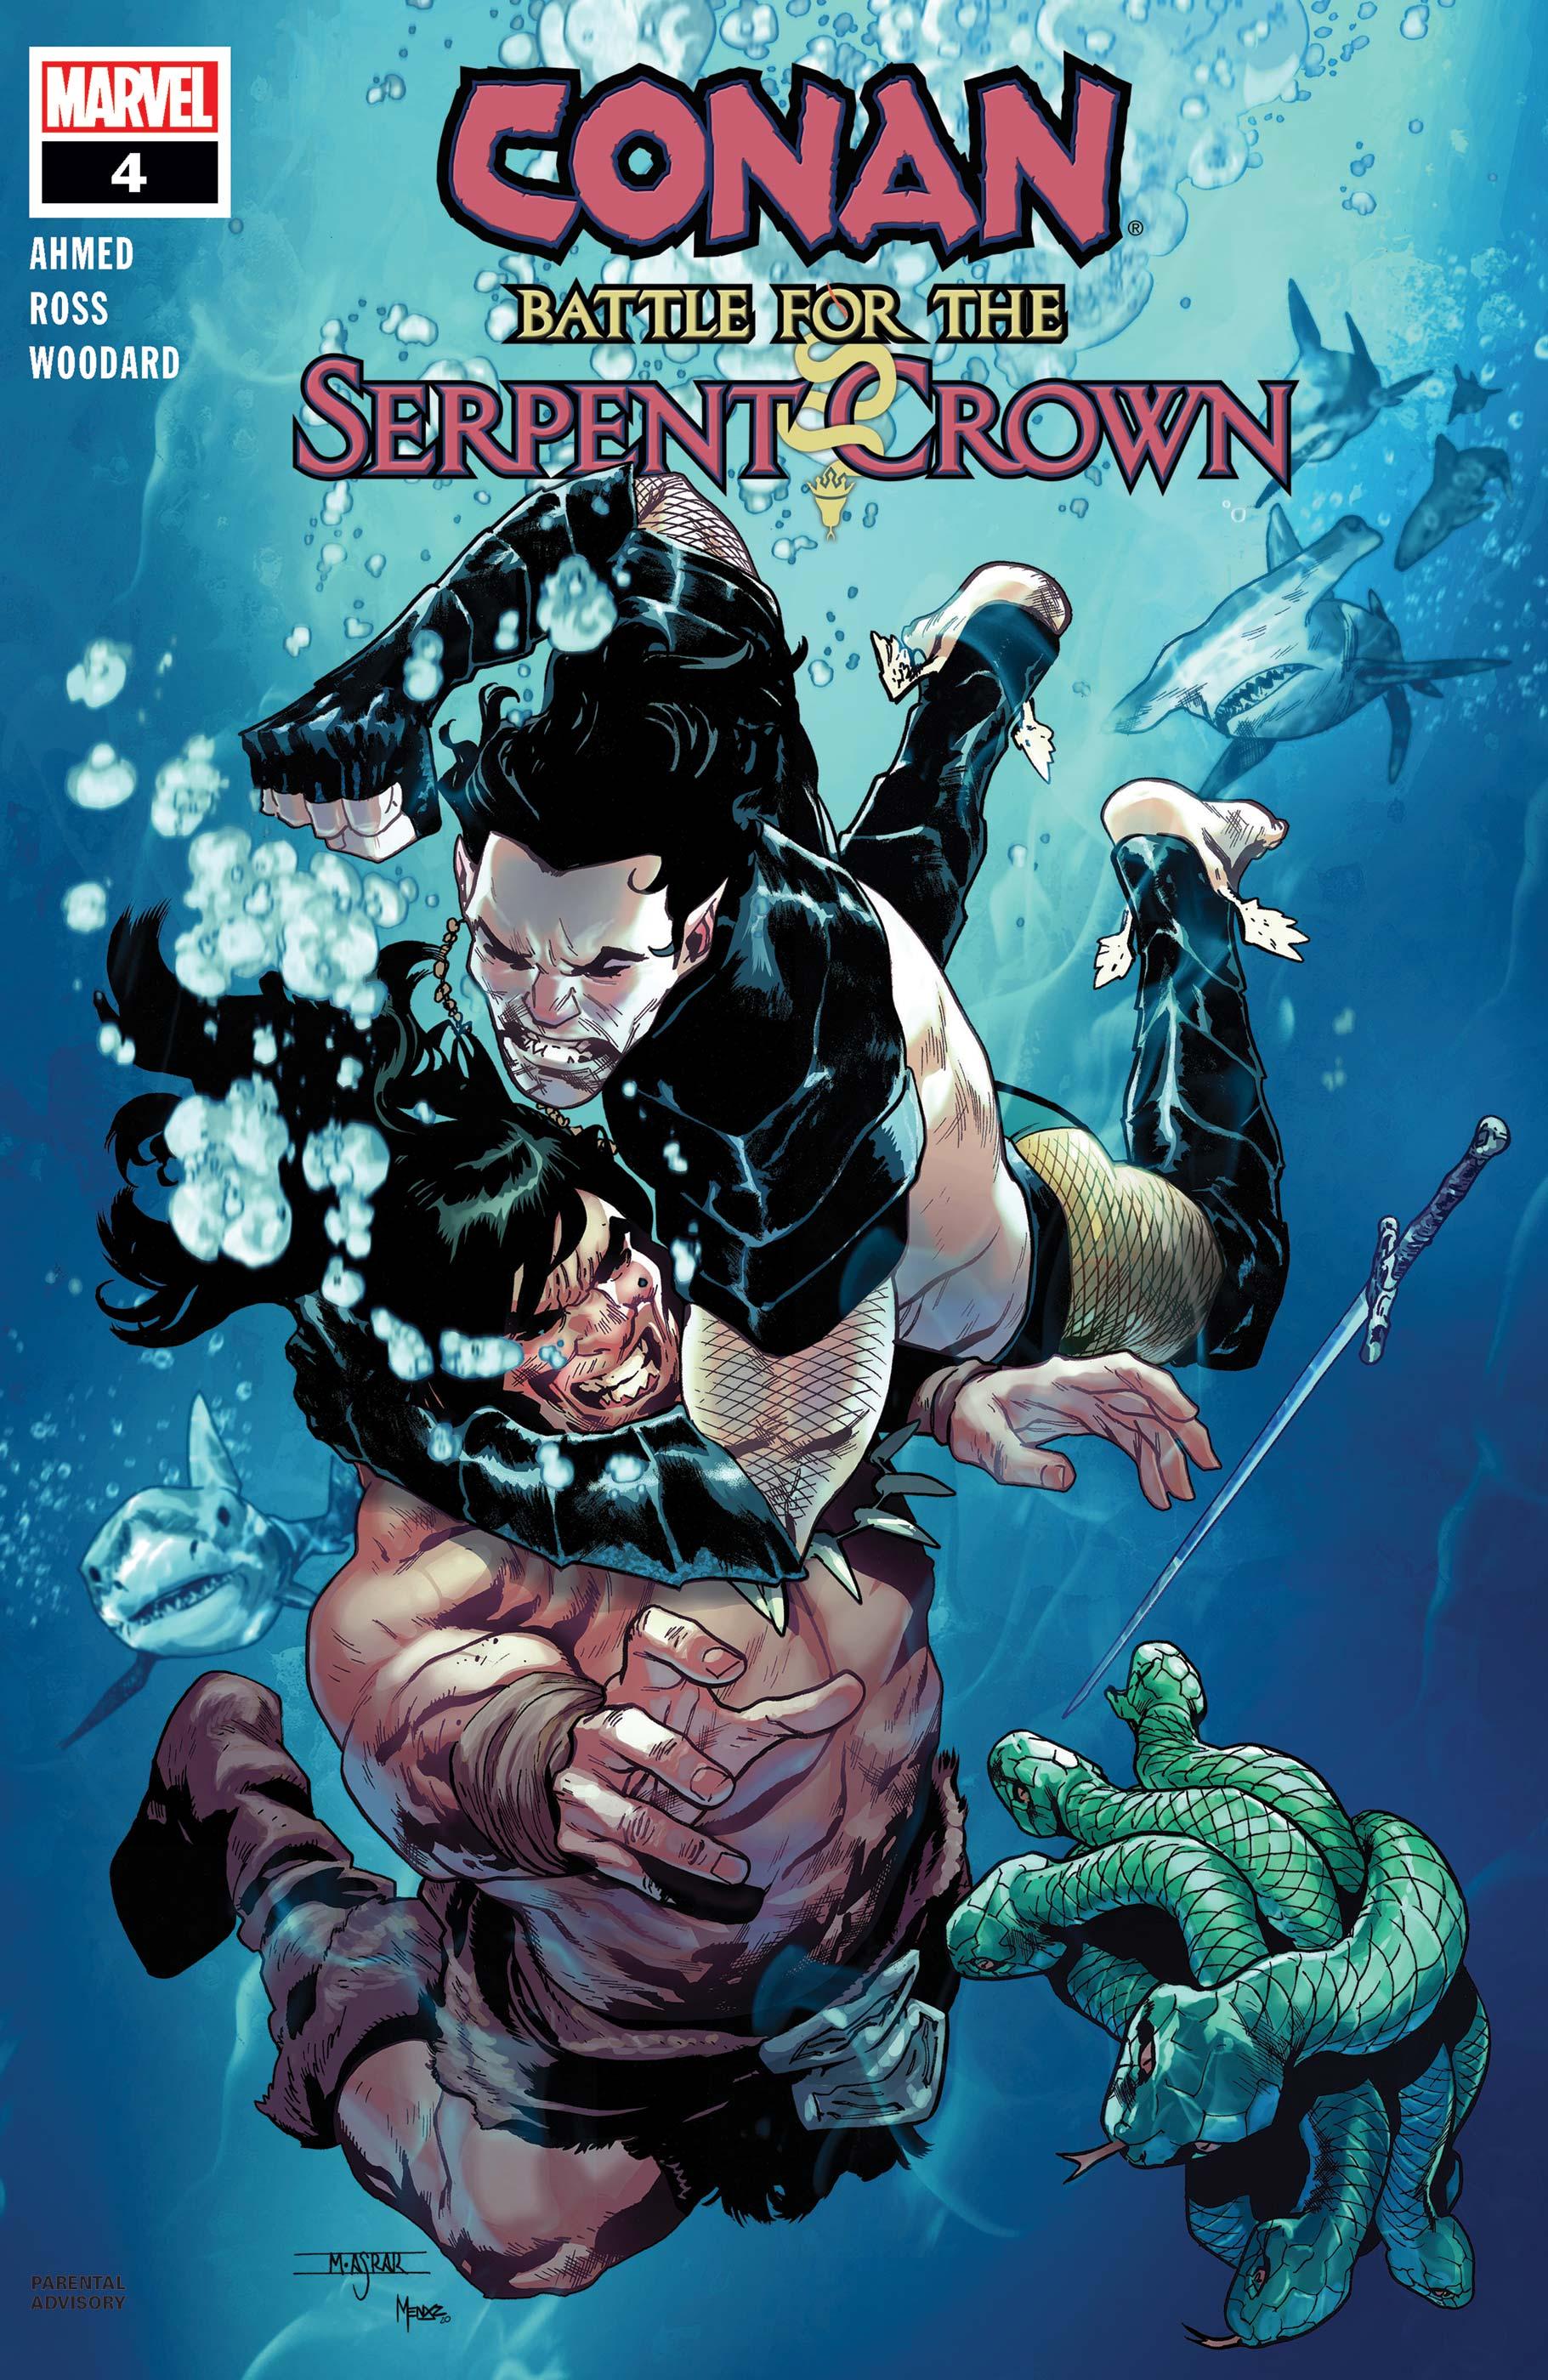 Conan: Battle for the Serpent Crown (2020) #4